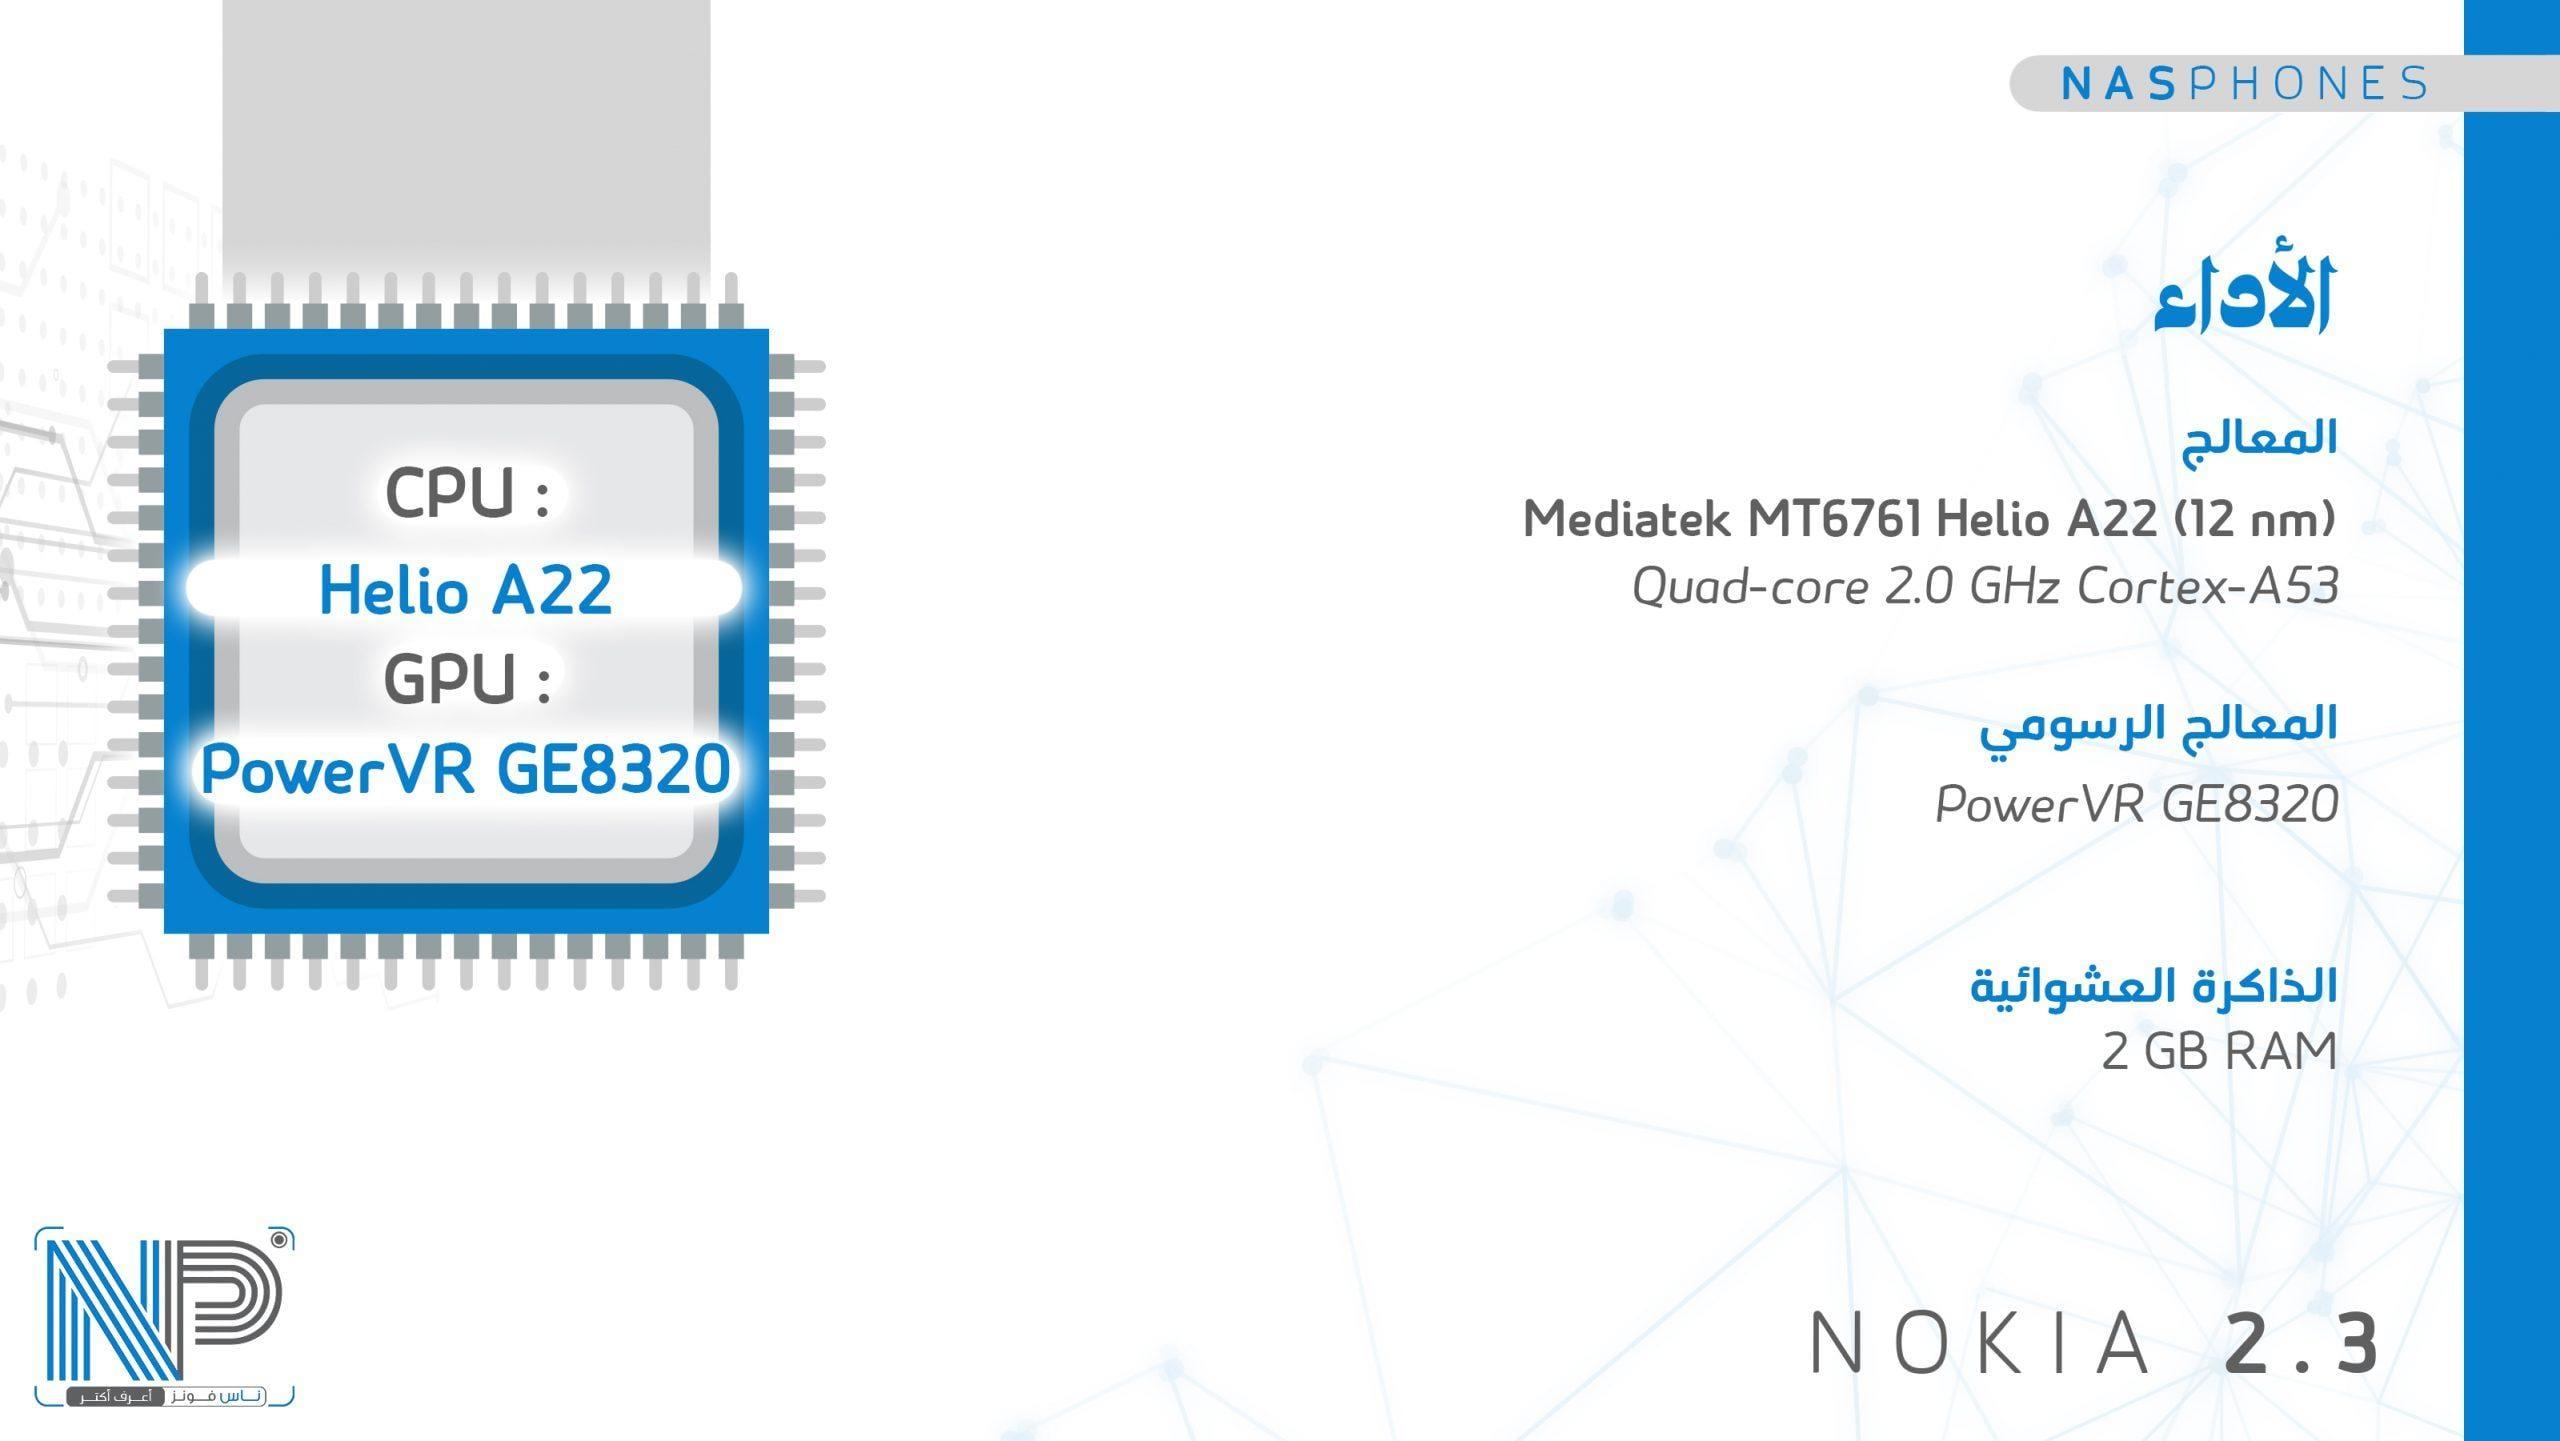 أداء موبايل Nokia 2.3